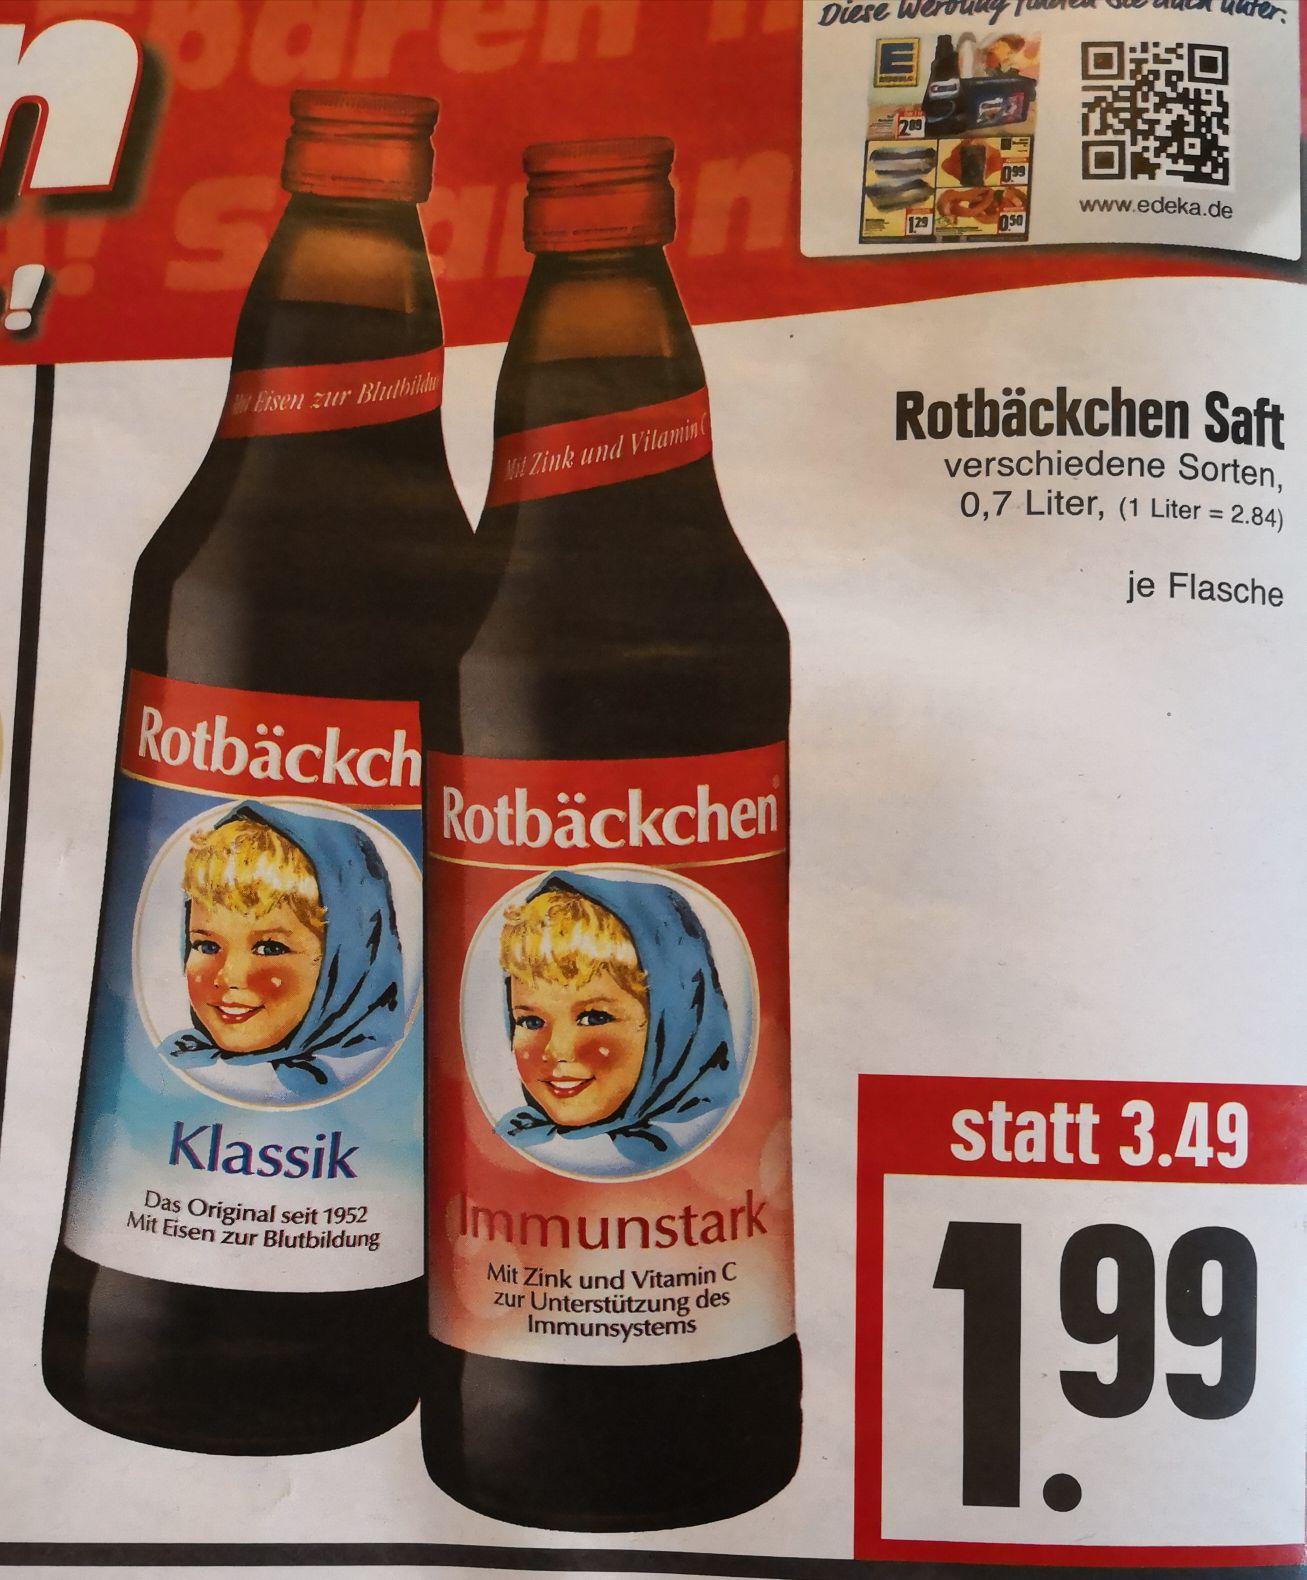 [EDEKA Hessenring] Rotbäckchen Saft verschiedene Sorten 0,7L Flasche